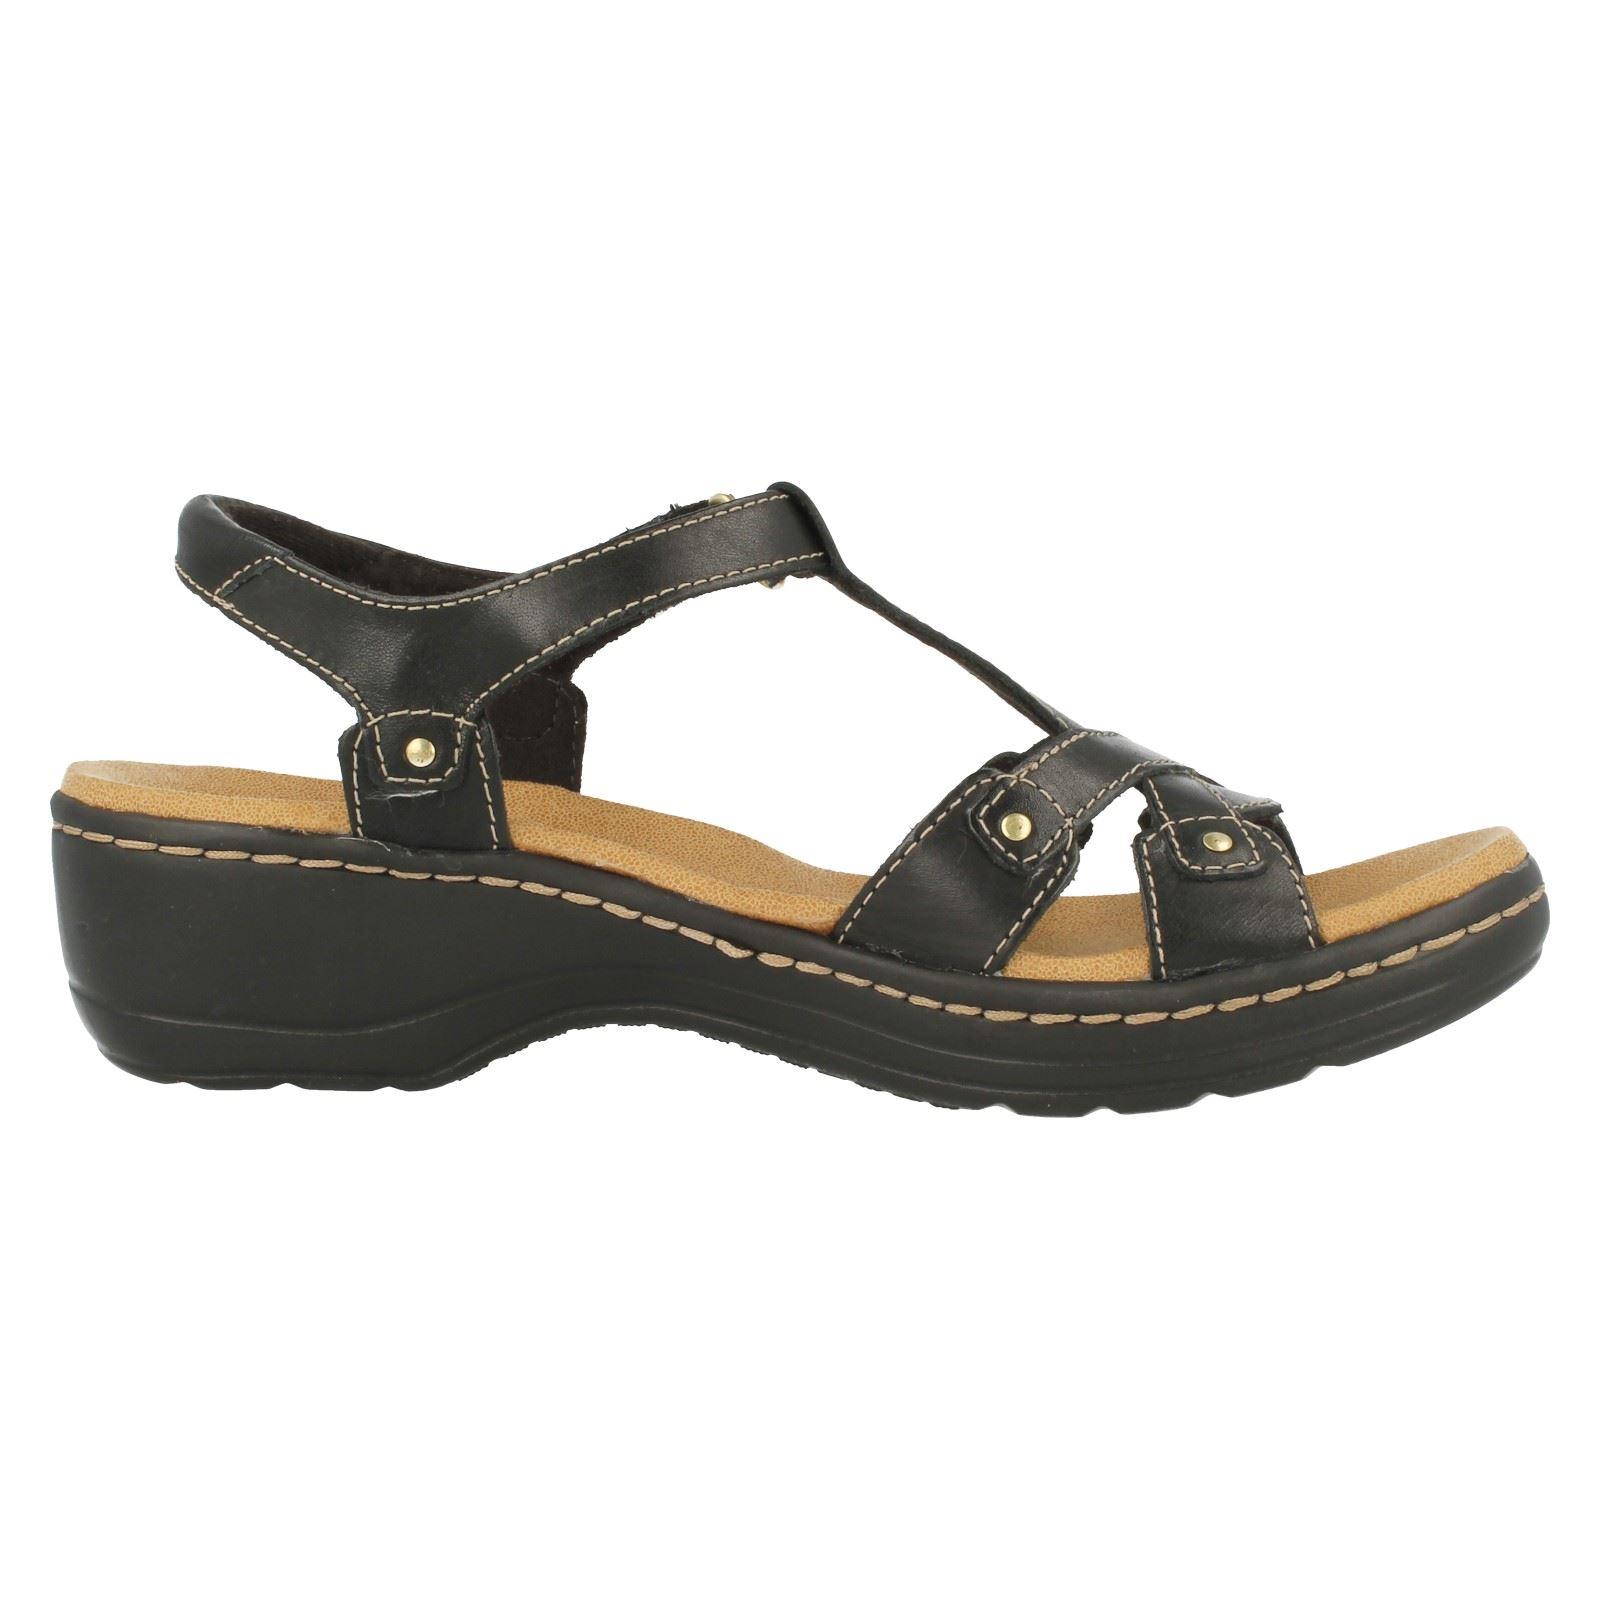 Sandalias de cuero señoras Clarks Hayla Flute